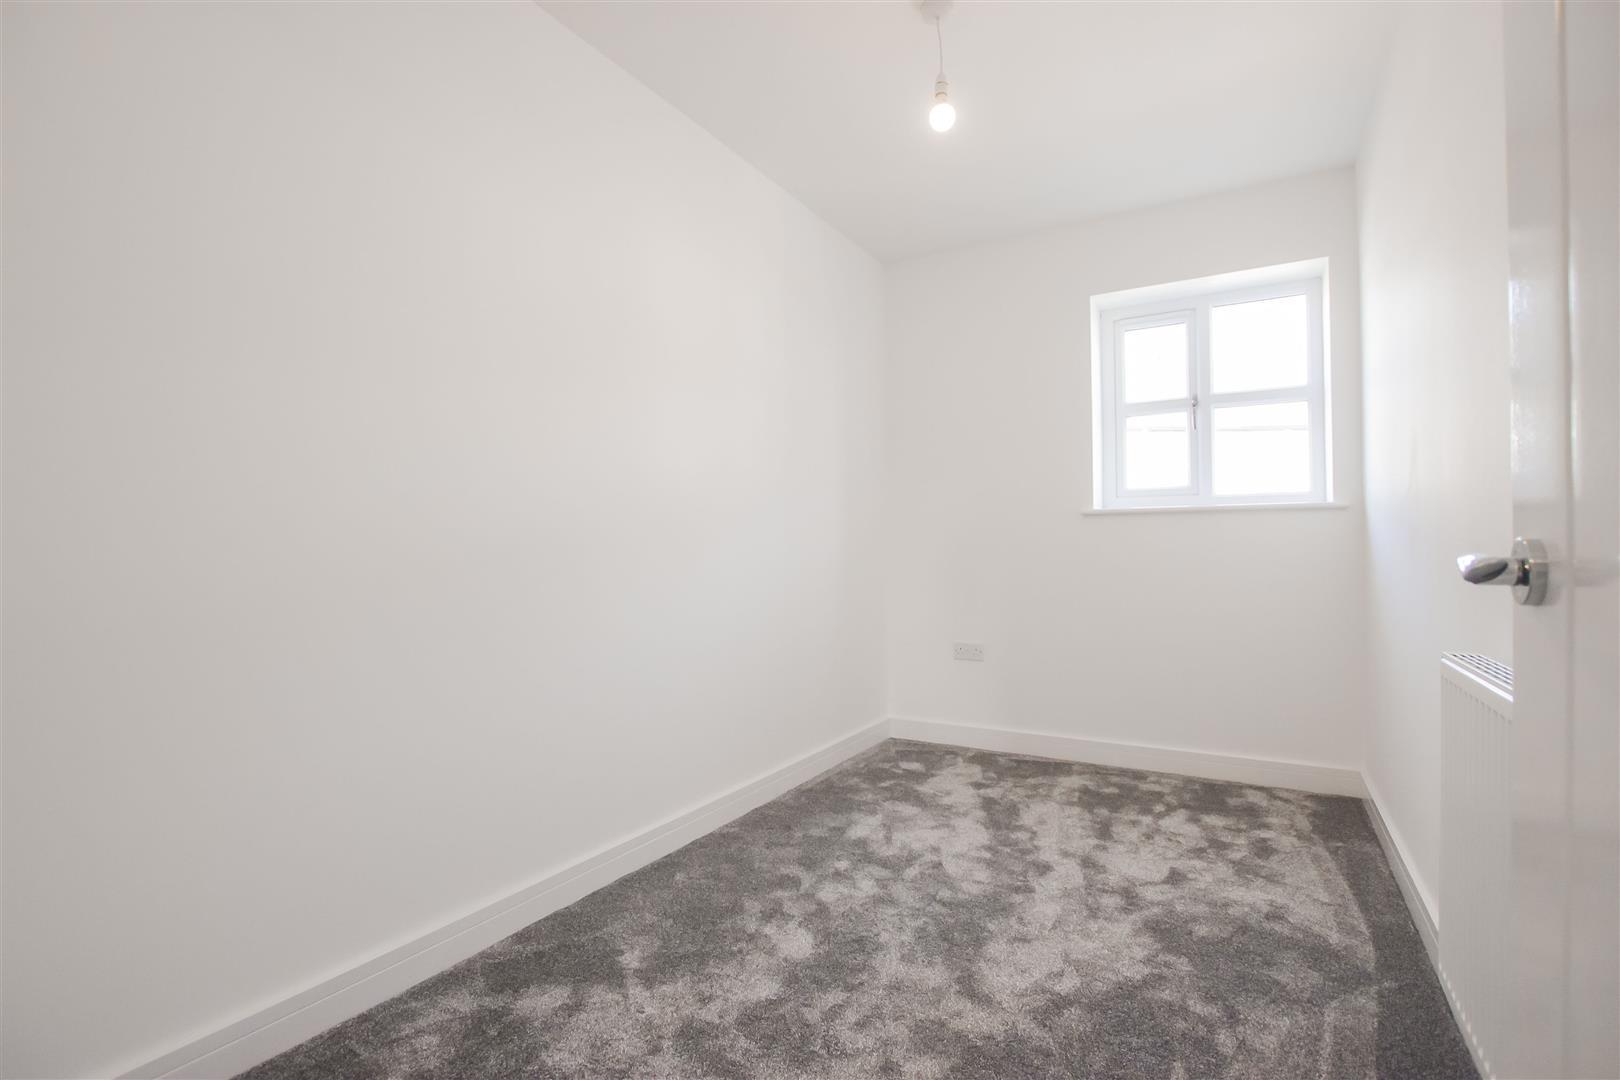 4 Bedroom Detached House For Sale - Show Home Bedroom 3 (1).jpg